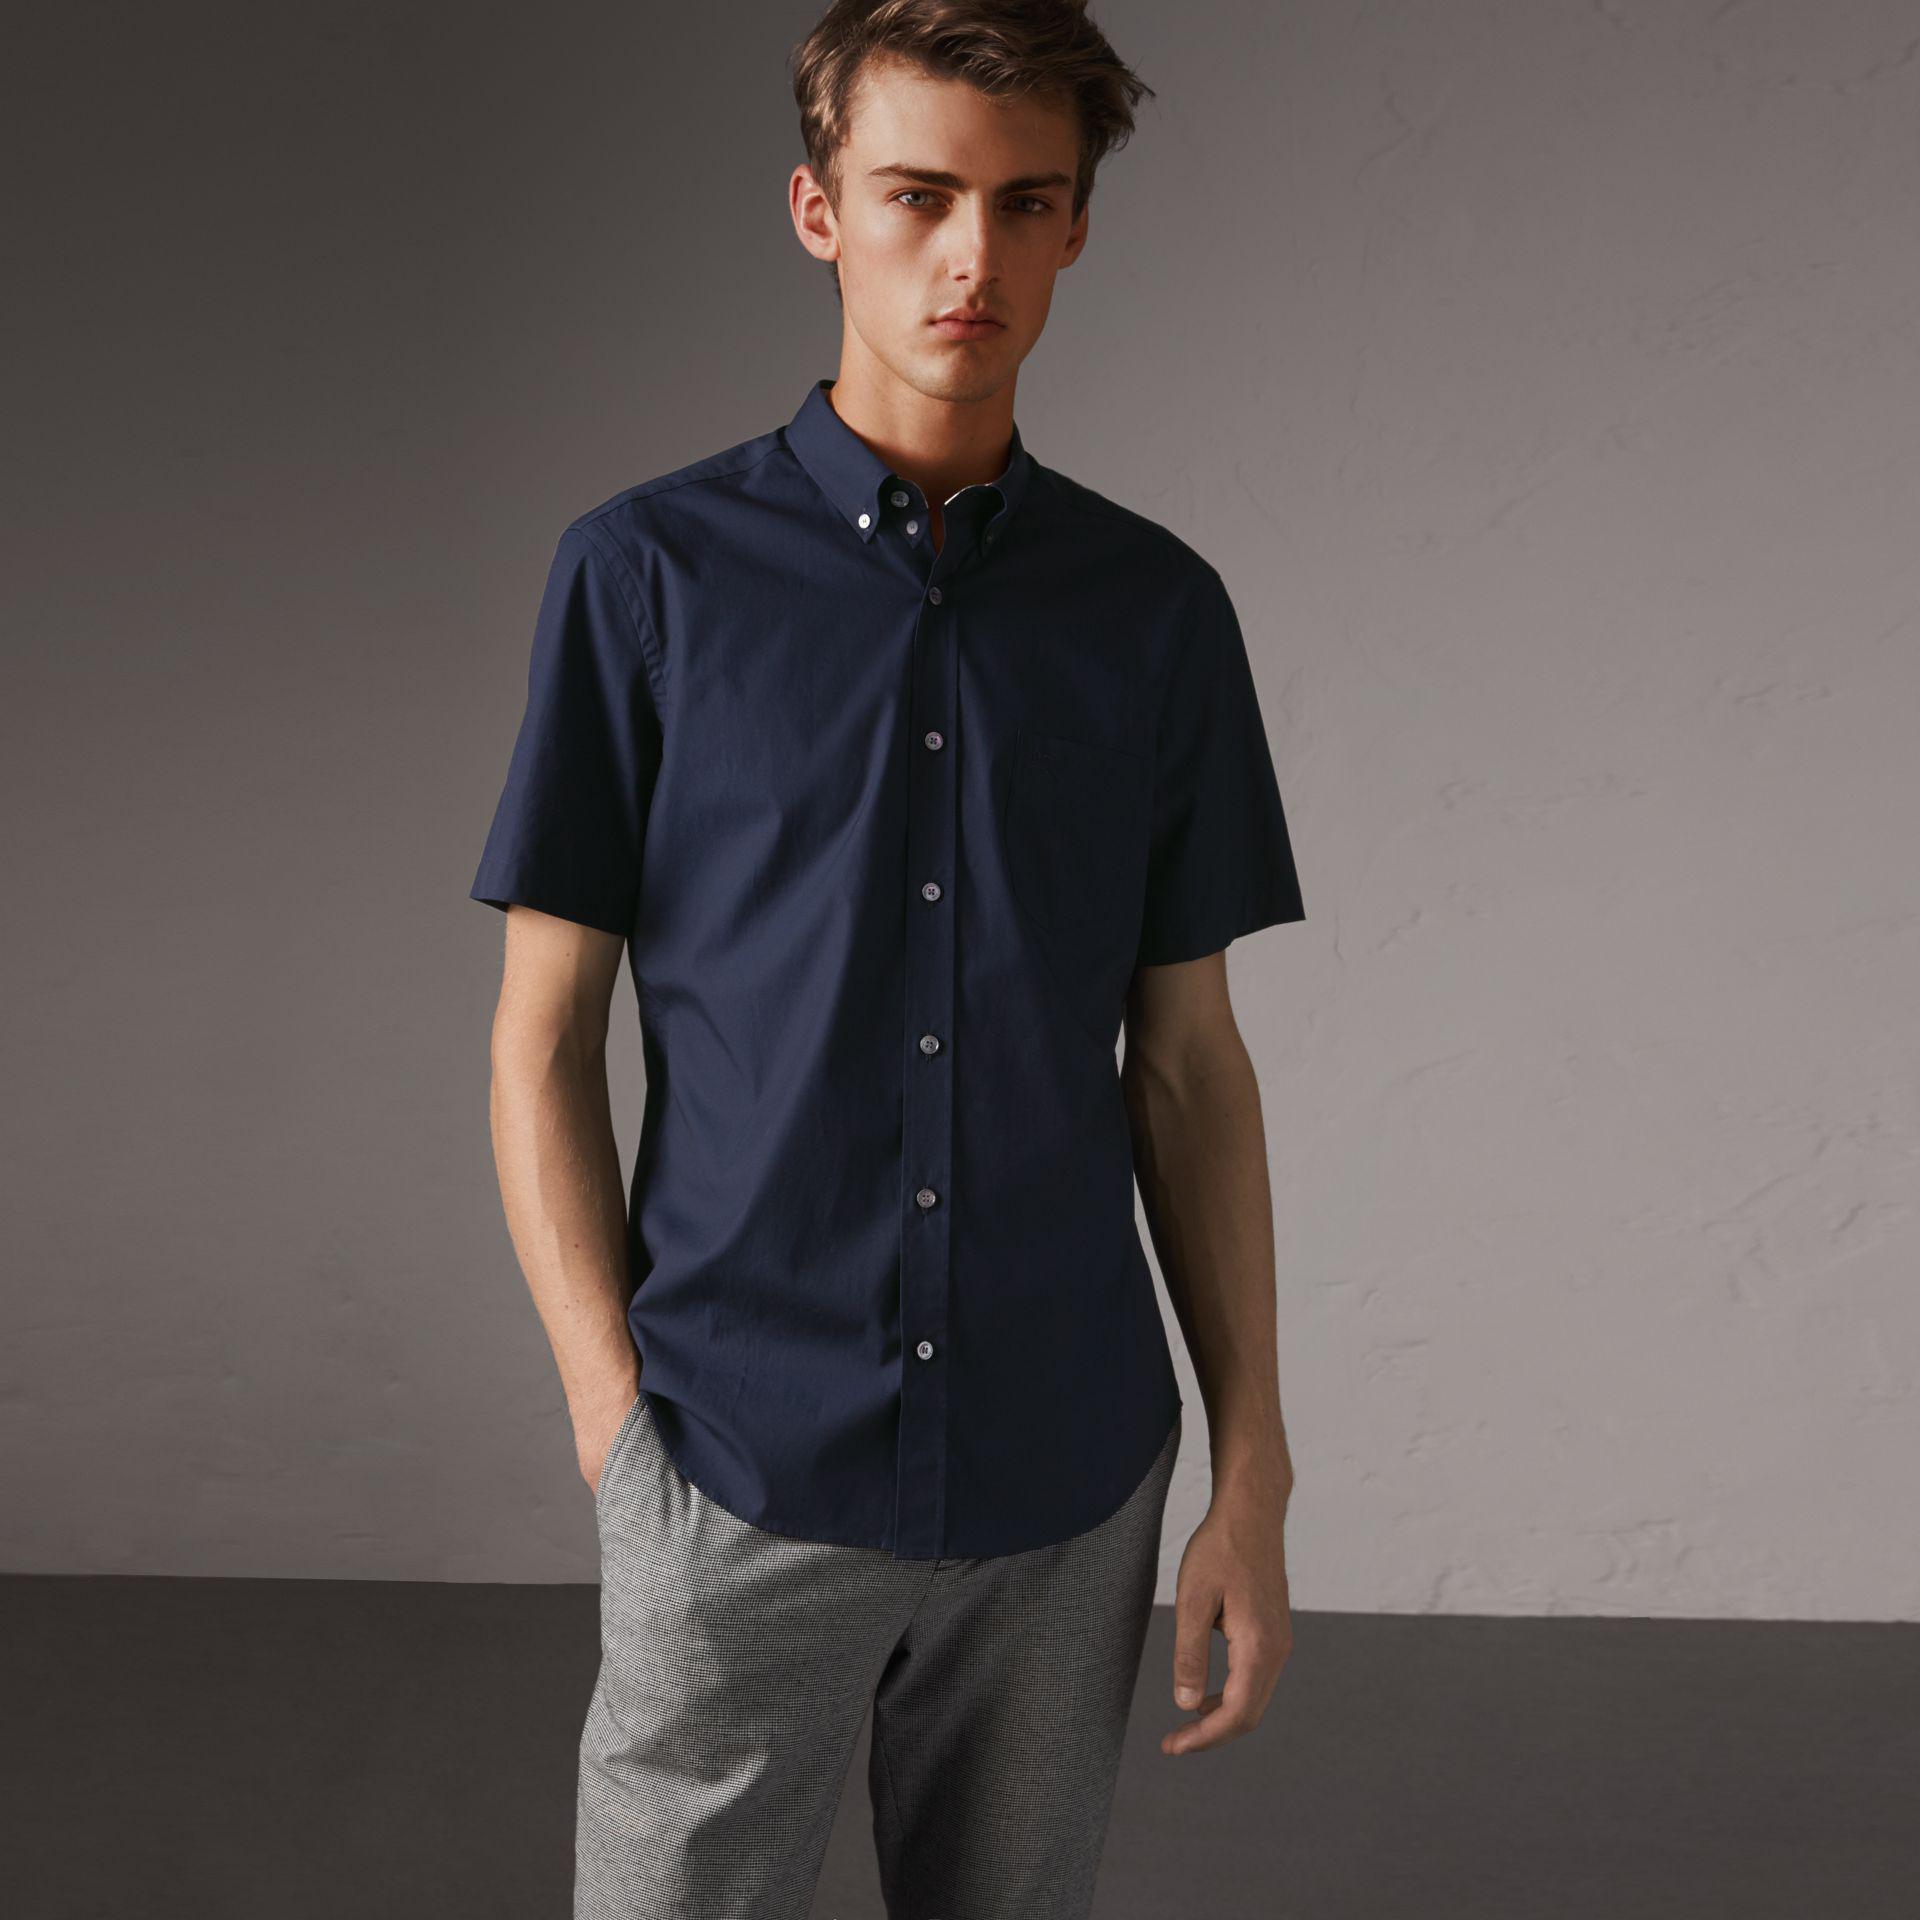 21b77db2b30e Lyst - Burberry Short-sleeved Stretch Cotton Poplin Shirt Navy in ...